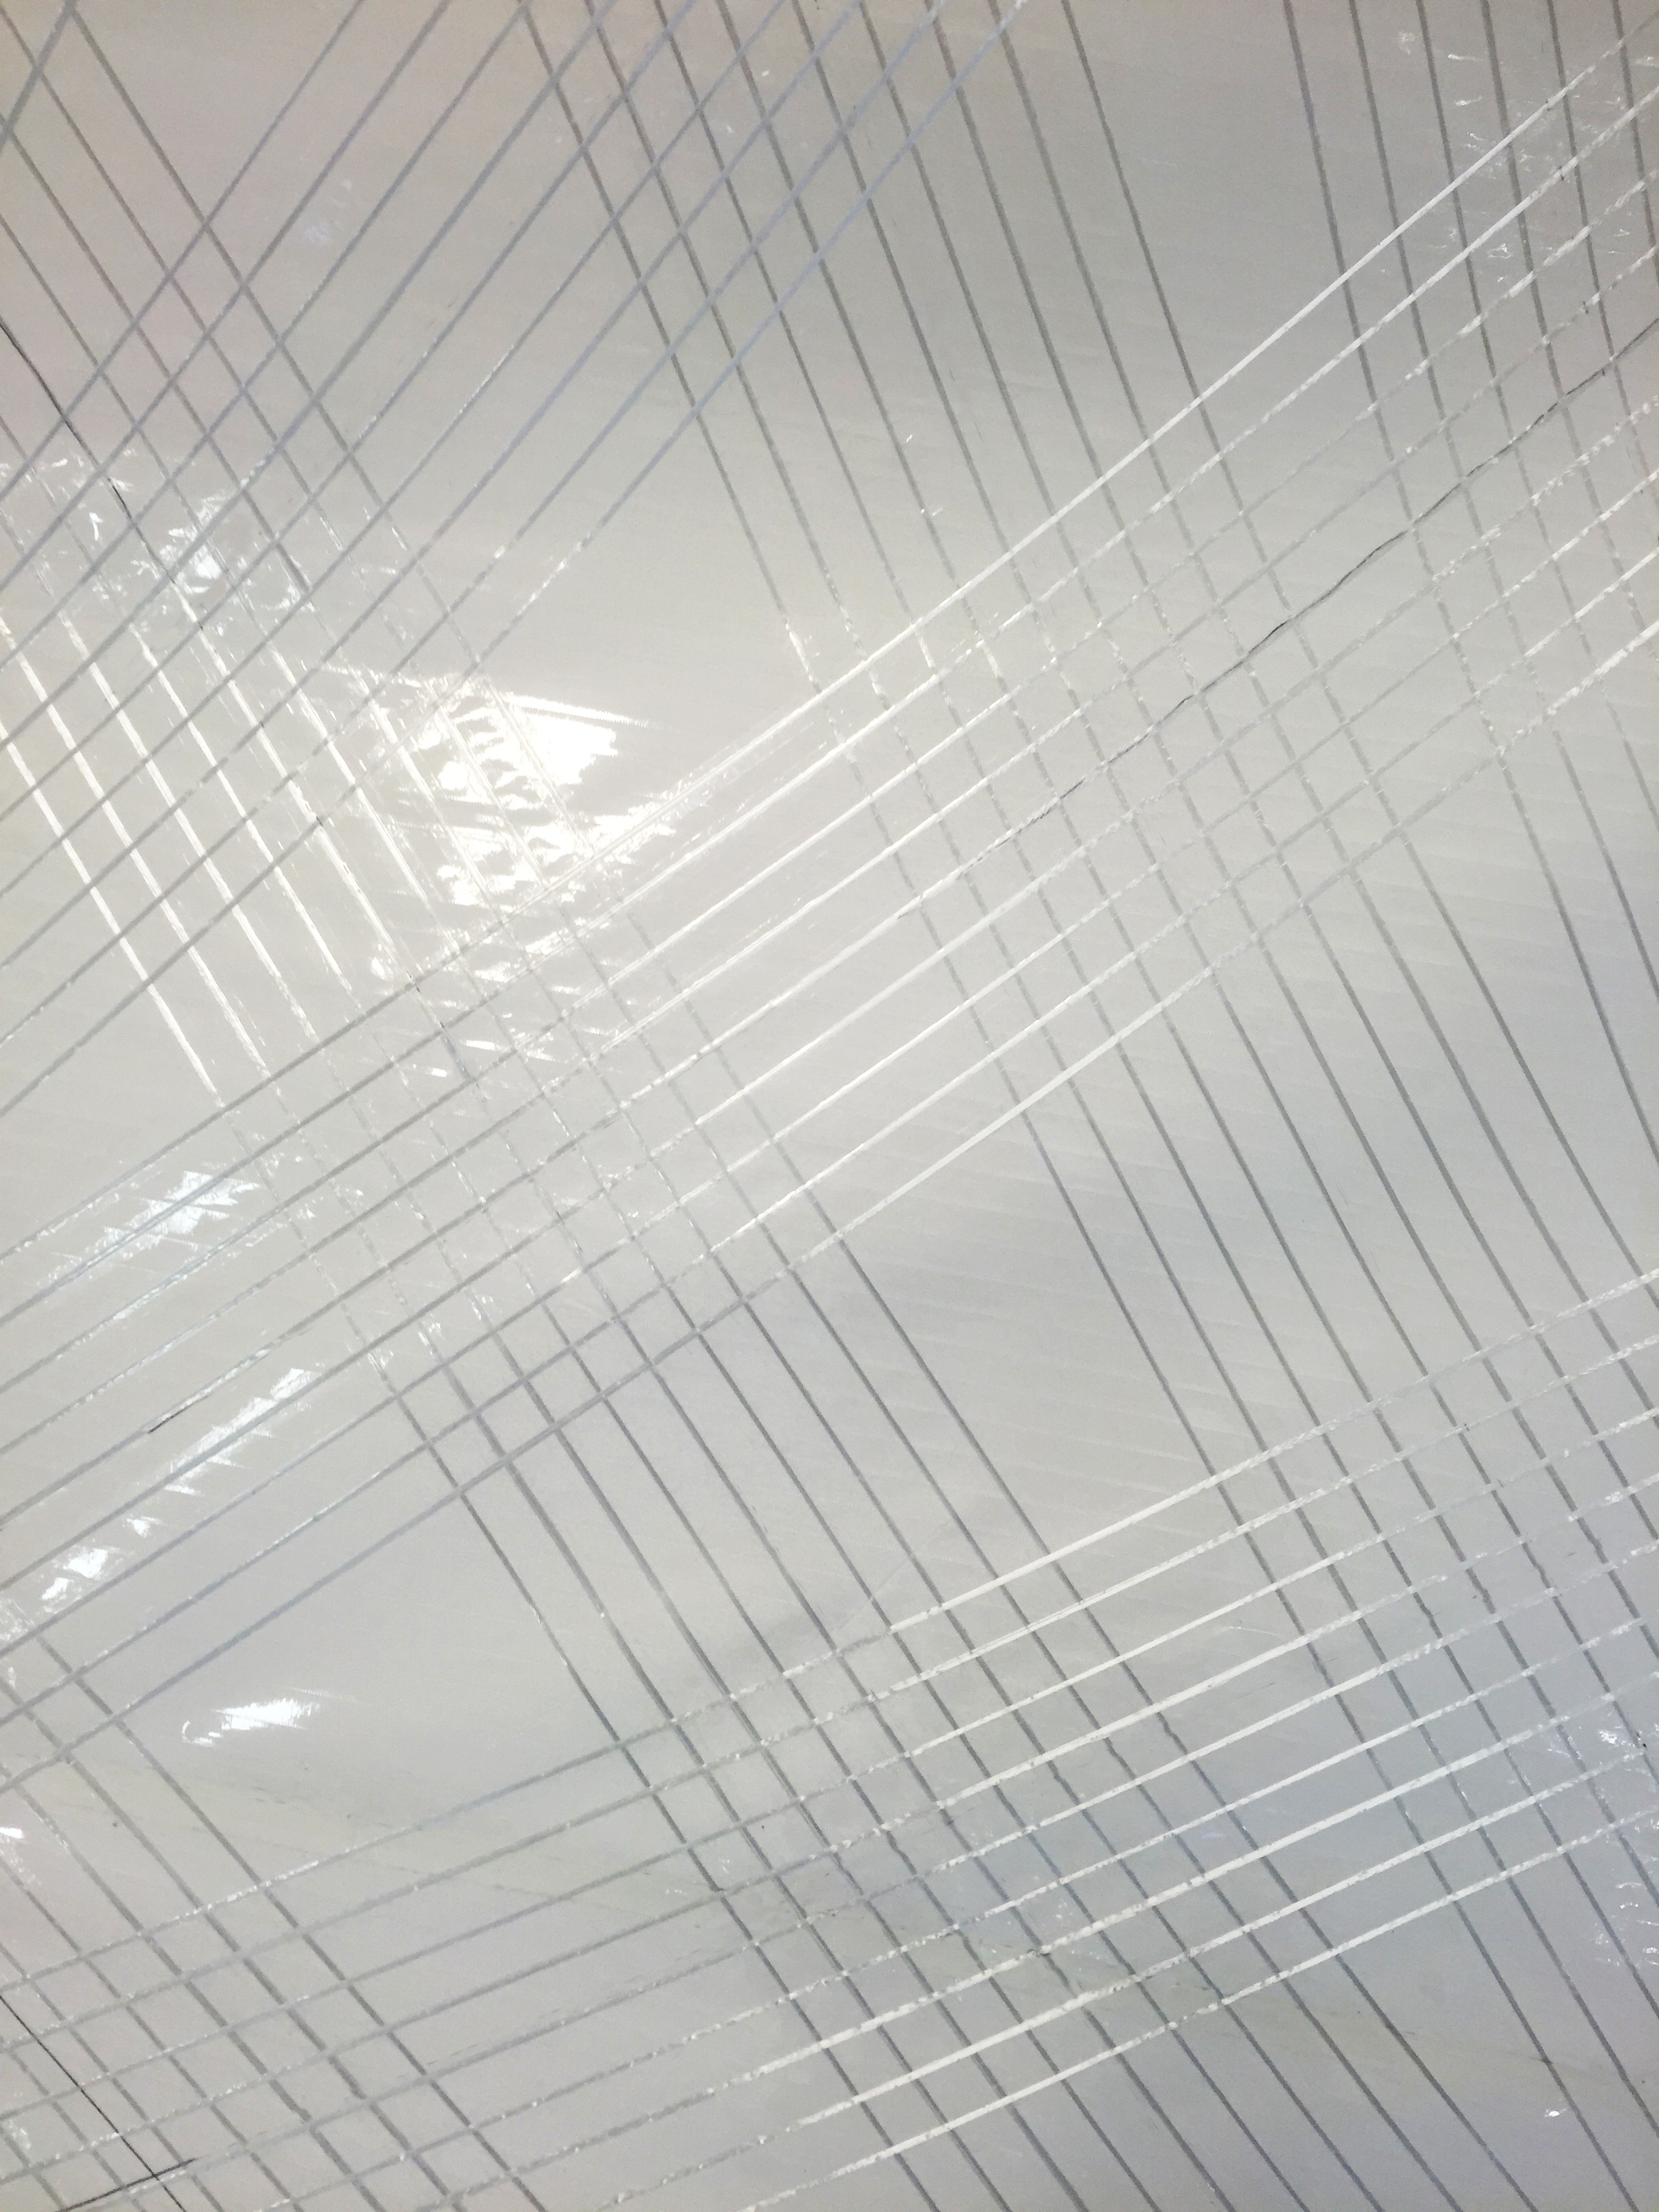 Close up image of an X-Drive Silver sail.